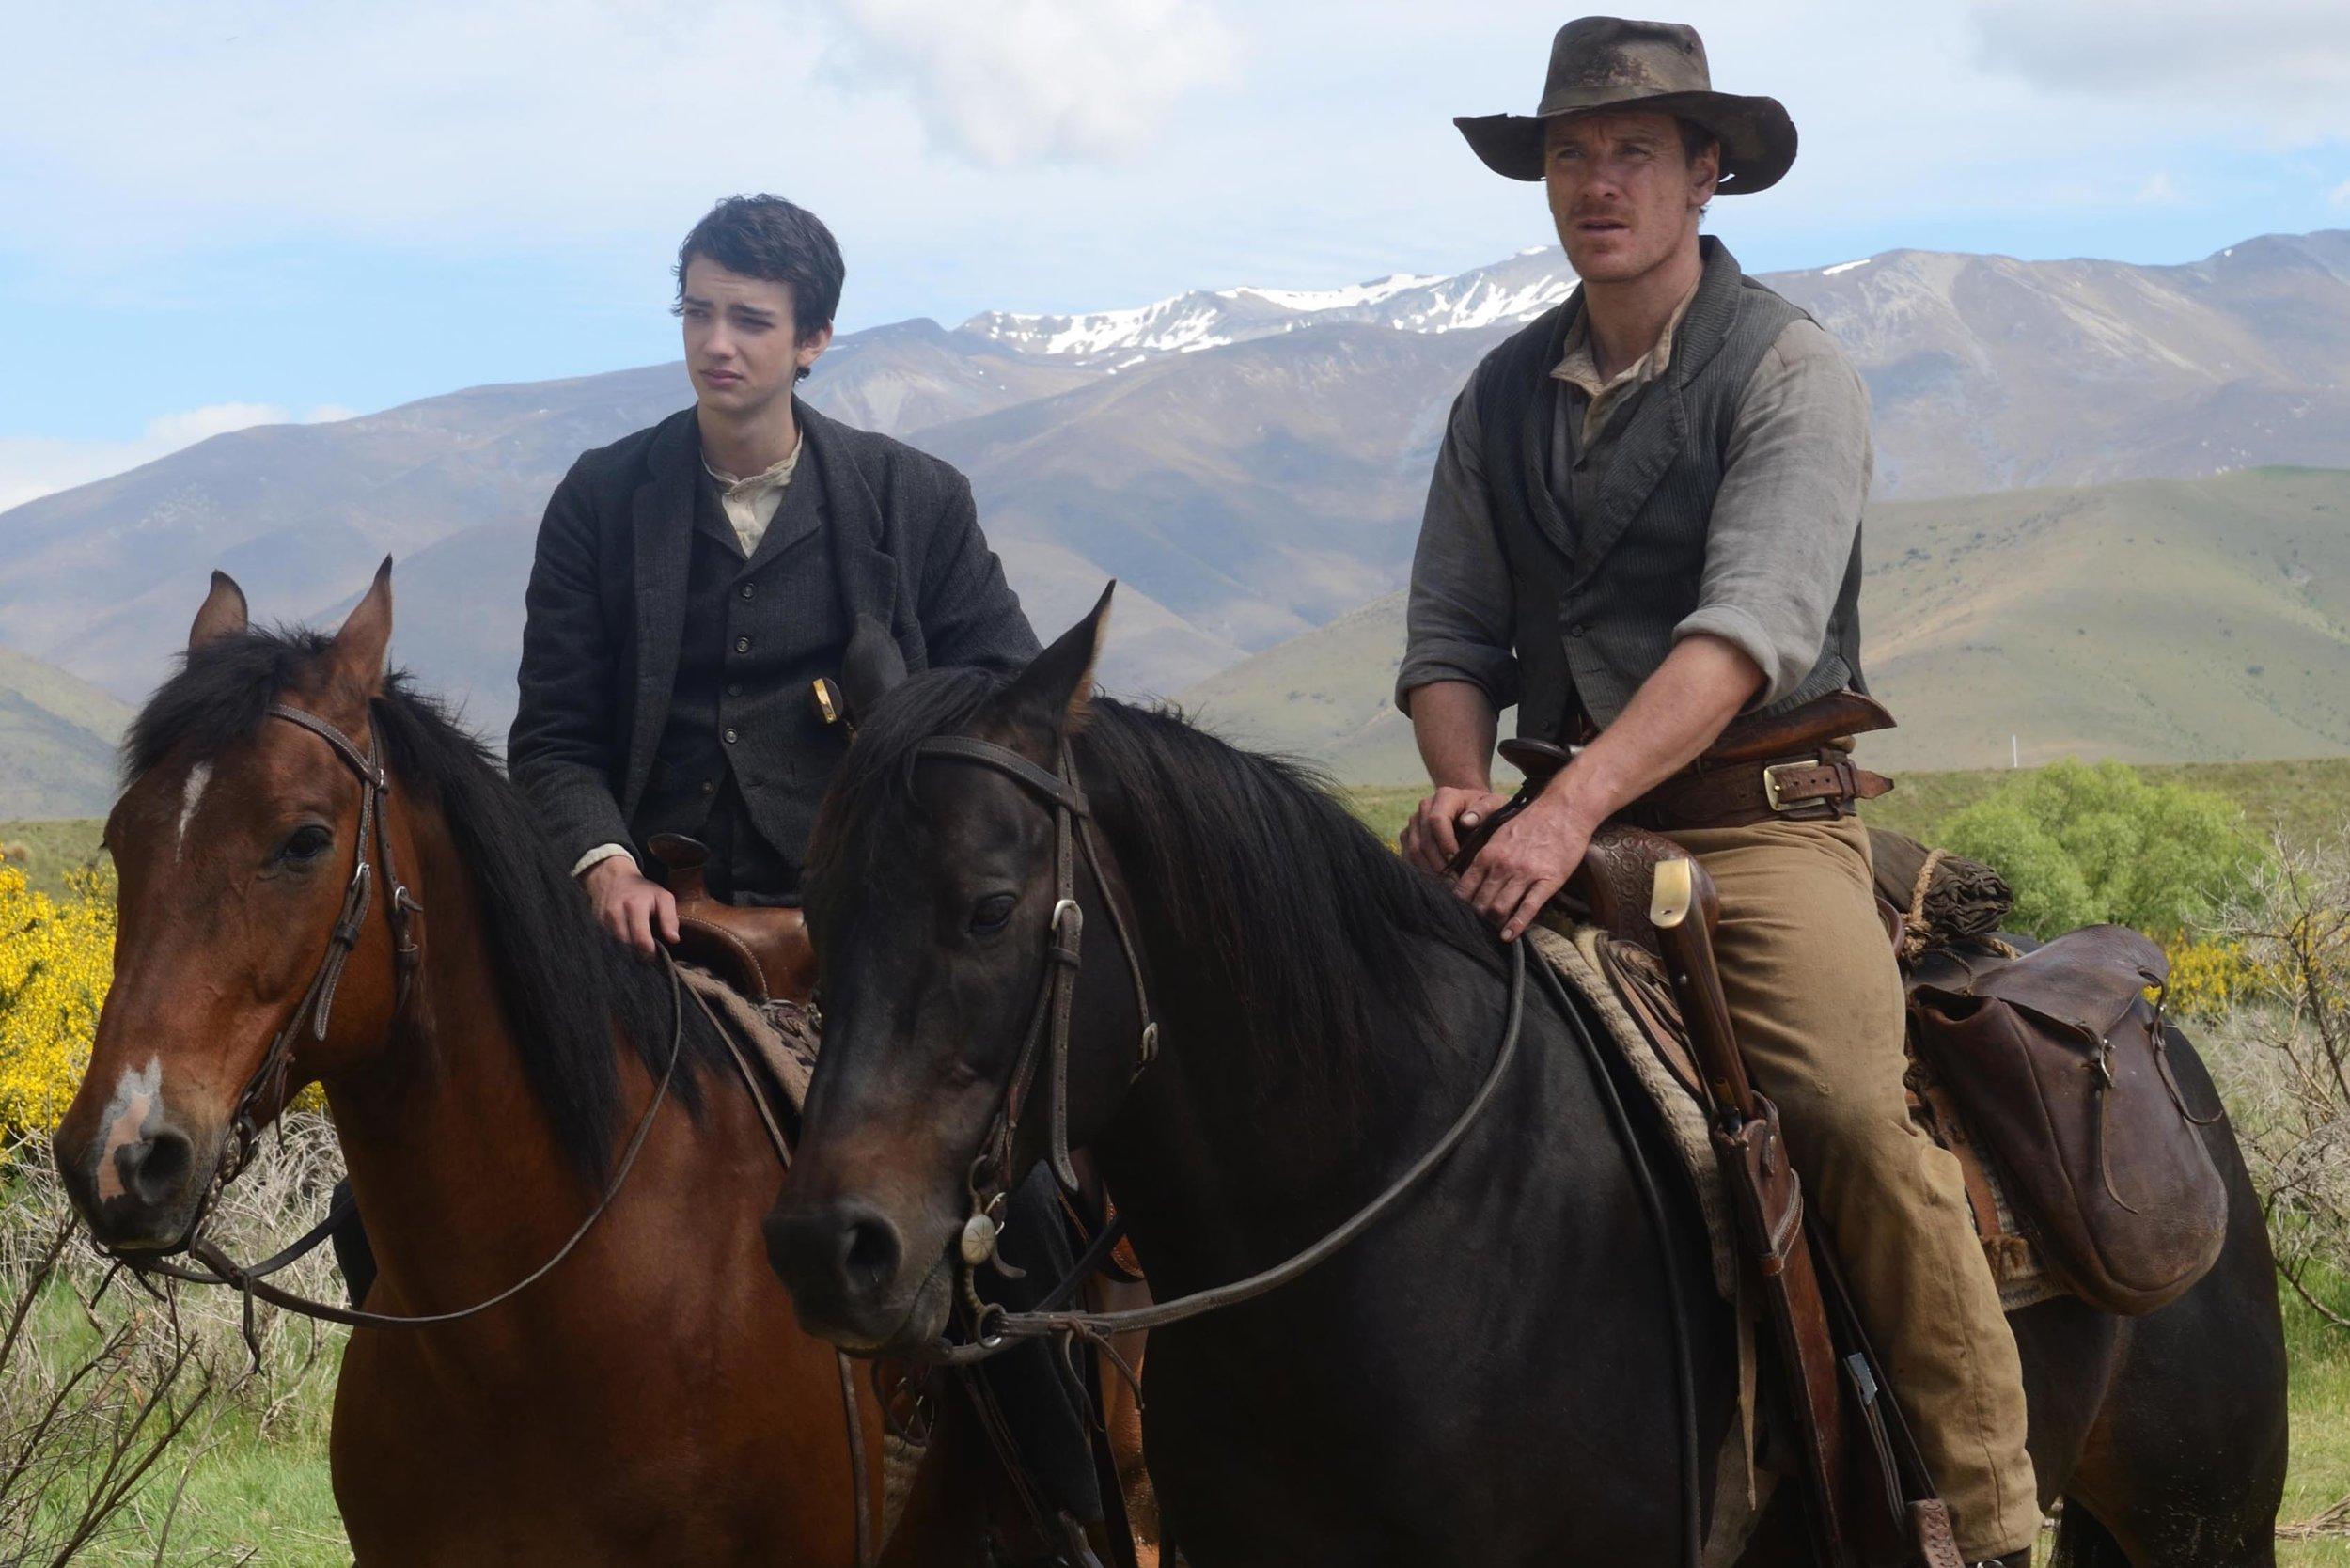 Kodi Smit-McPhee and Michael Fassbender in 'Slow West'